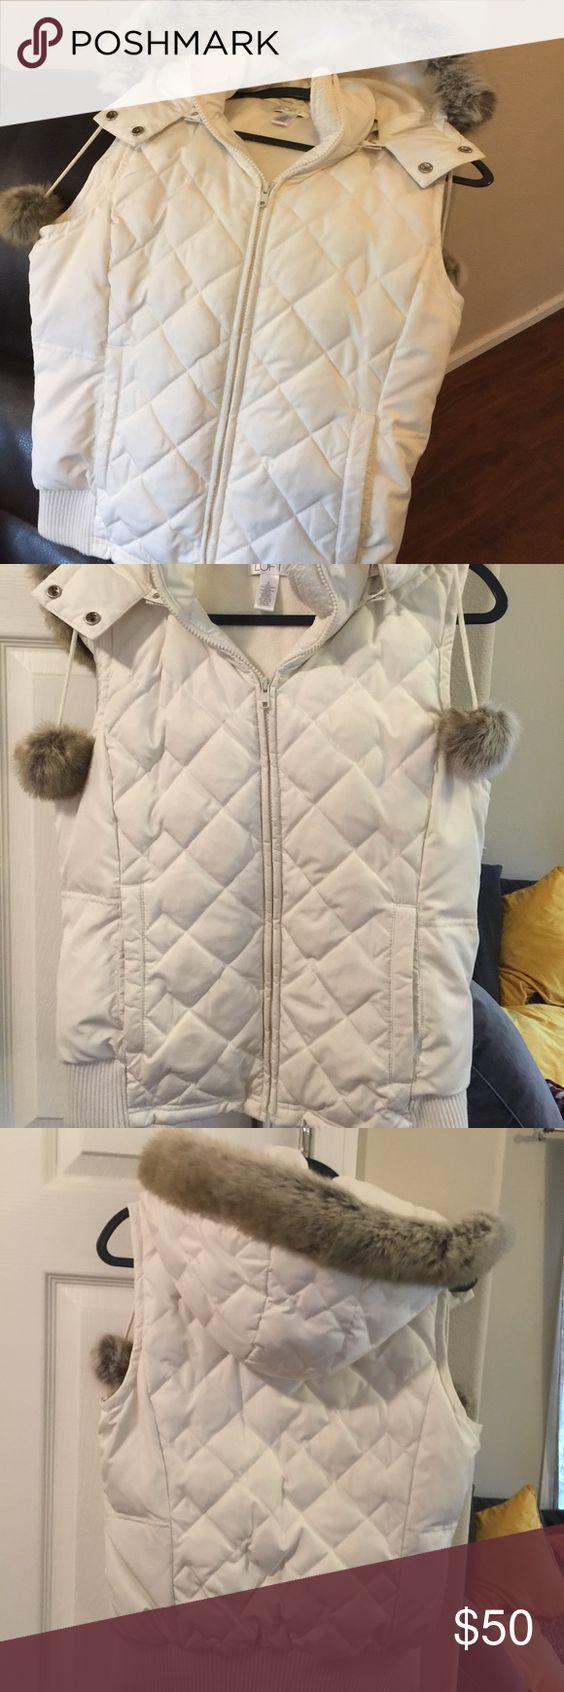 Loft faux fur hoodie vest M Cute warm vest with fur removable hood Super warm size M Great 👍 condition no stains or rips. LOFT Jackets & Coats Puffers